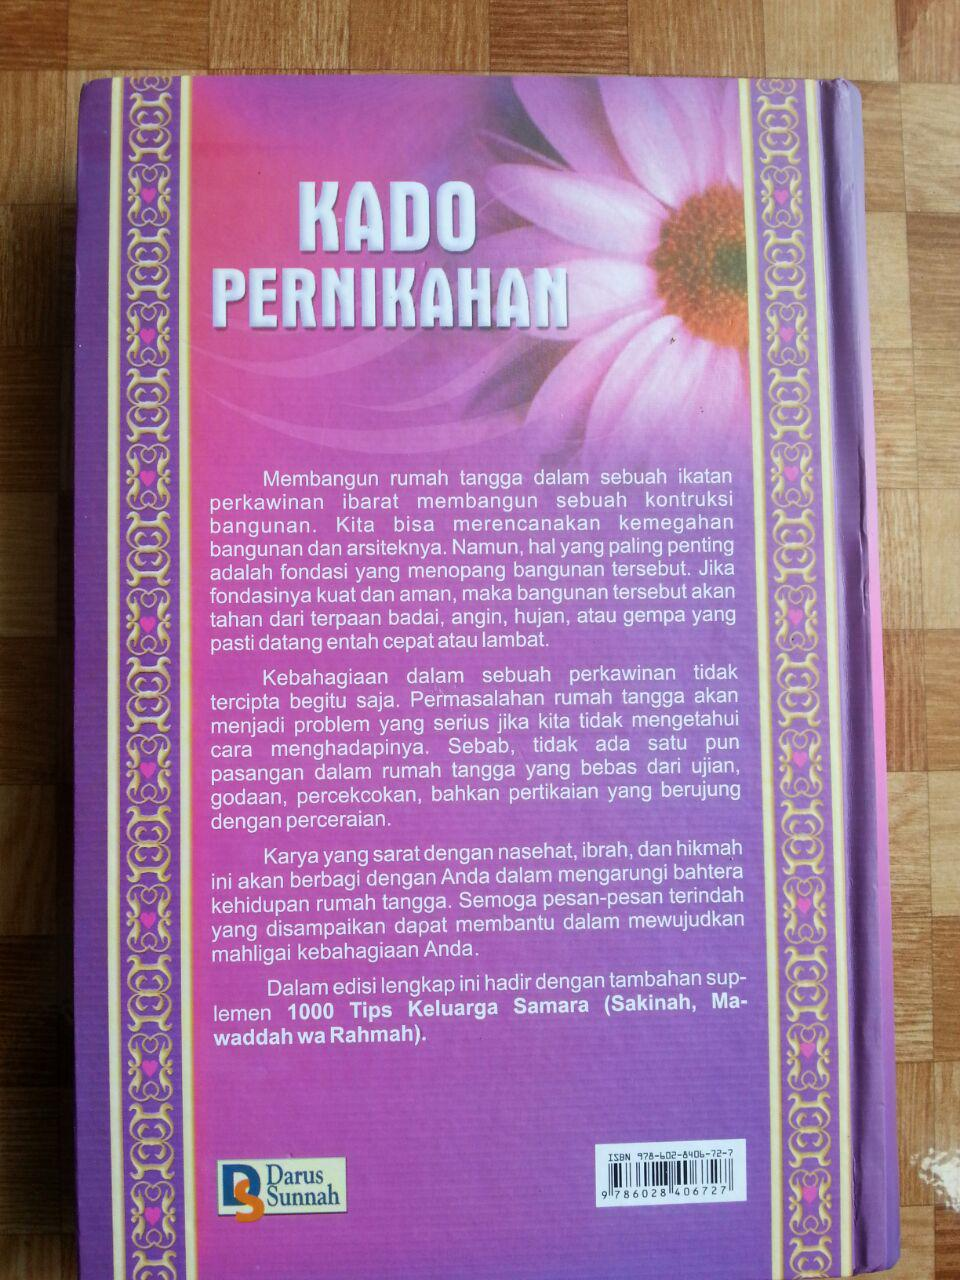 Buku Kado Pernikahan cover